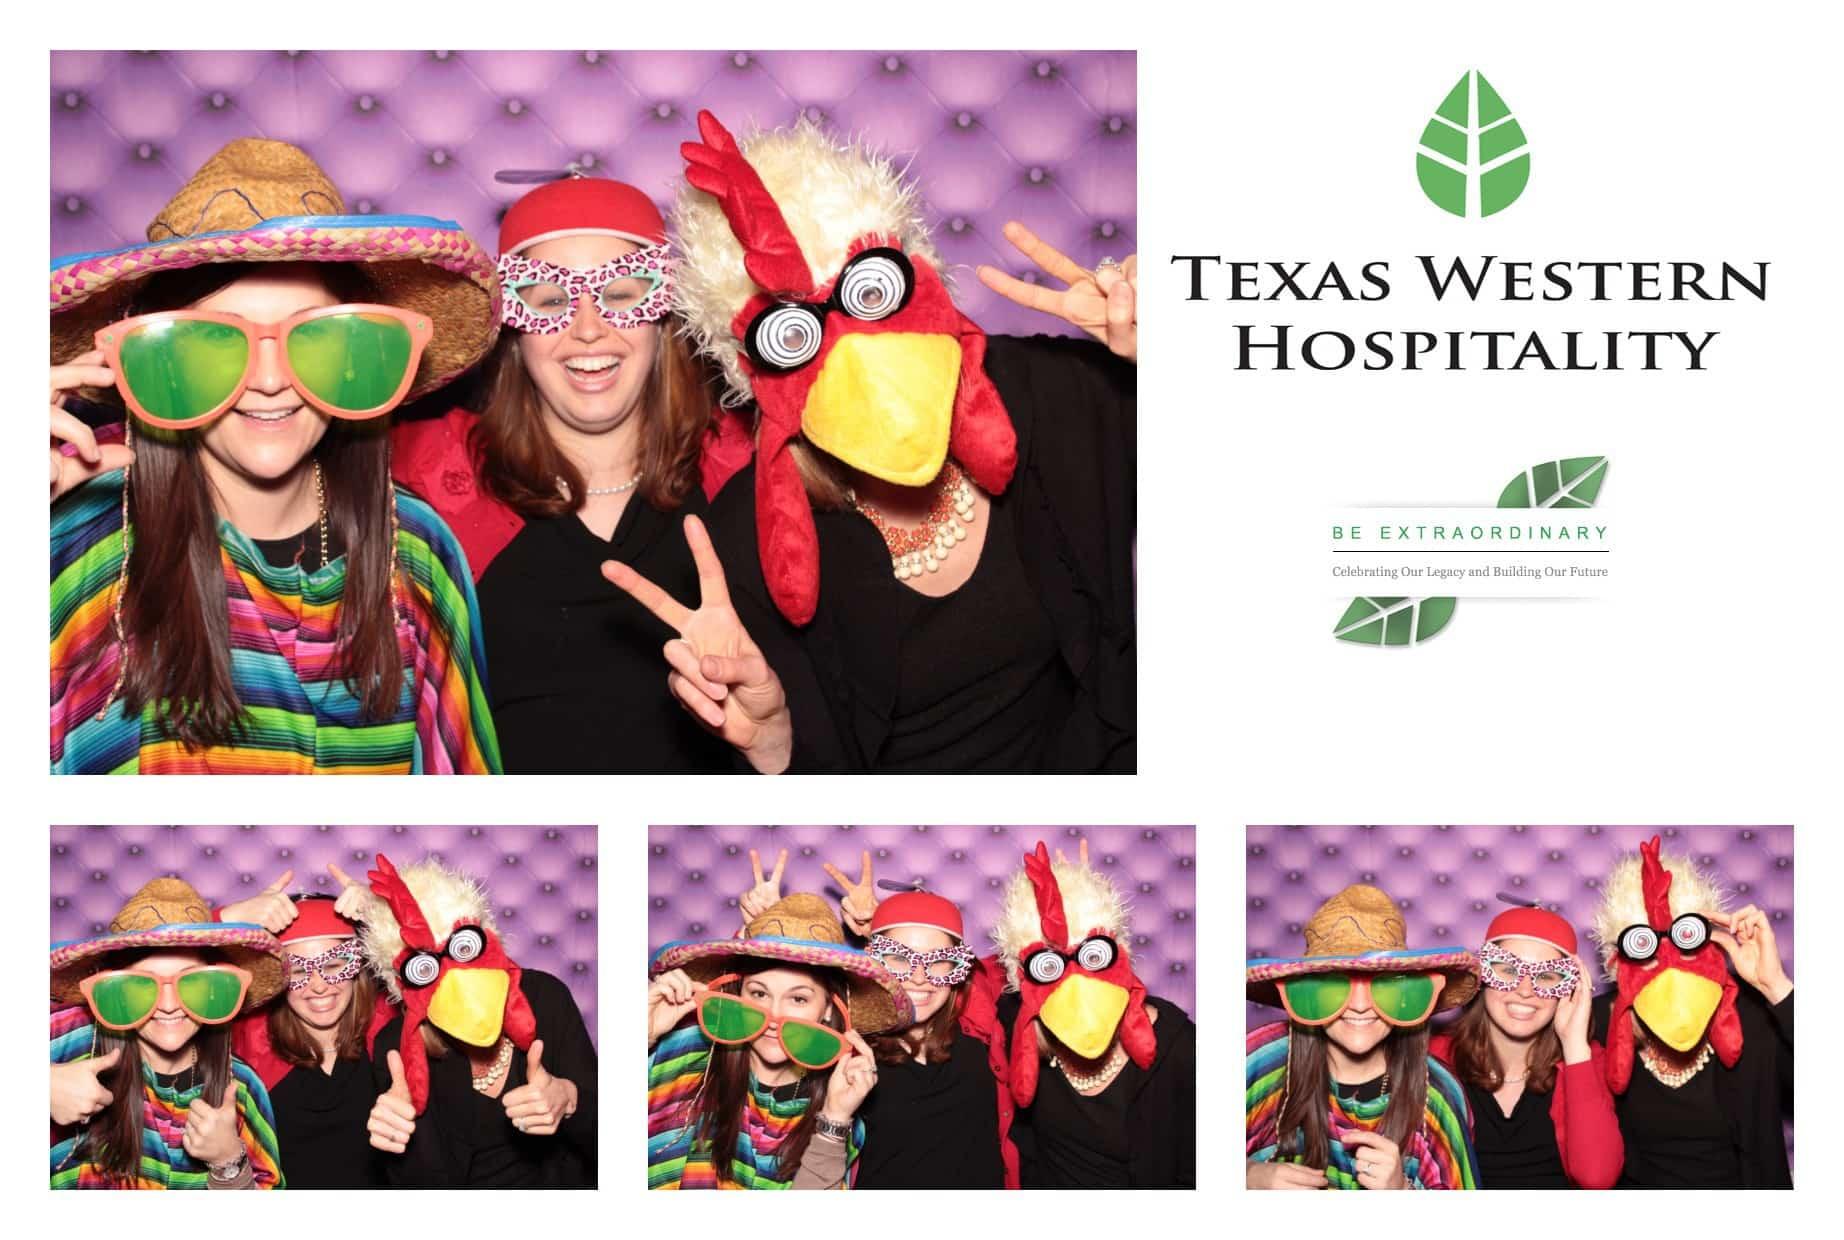 Photobooth-Rental-Austin-San Antonio-Horseshoe Bay-Memories-Party-No.1-Gala-Live Oak-Best